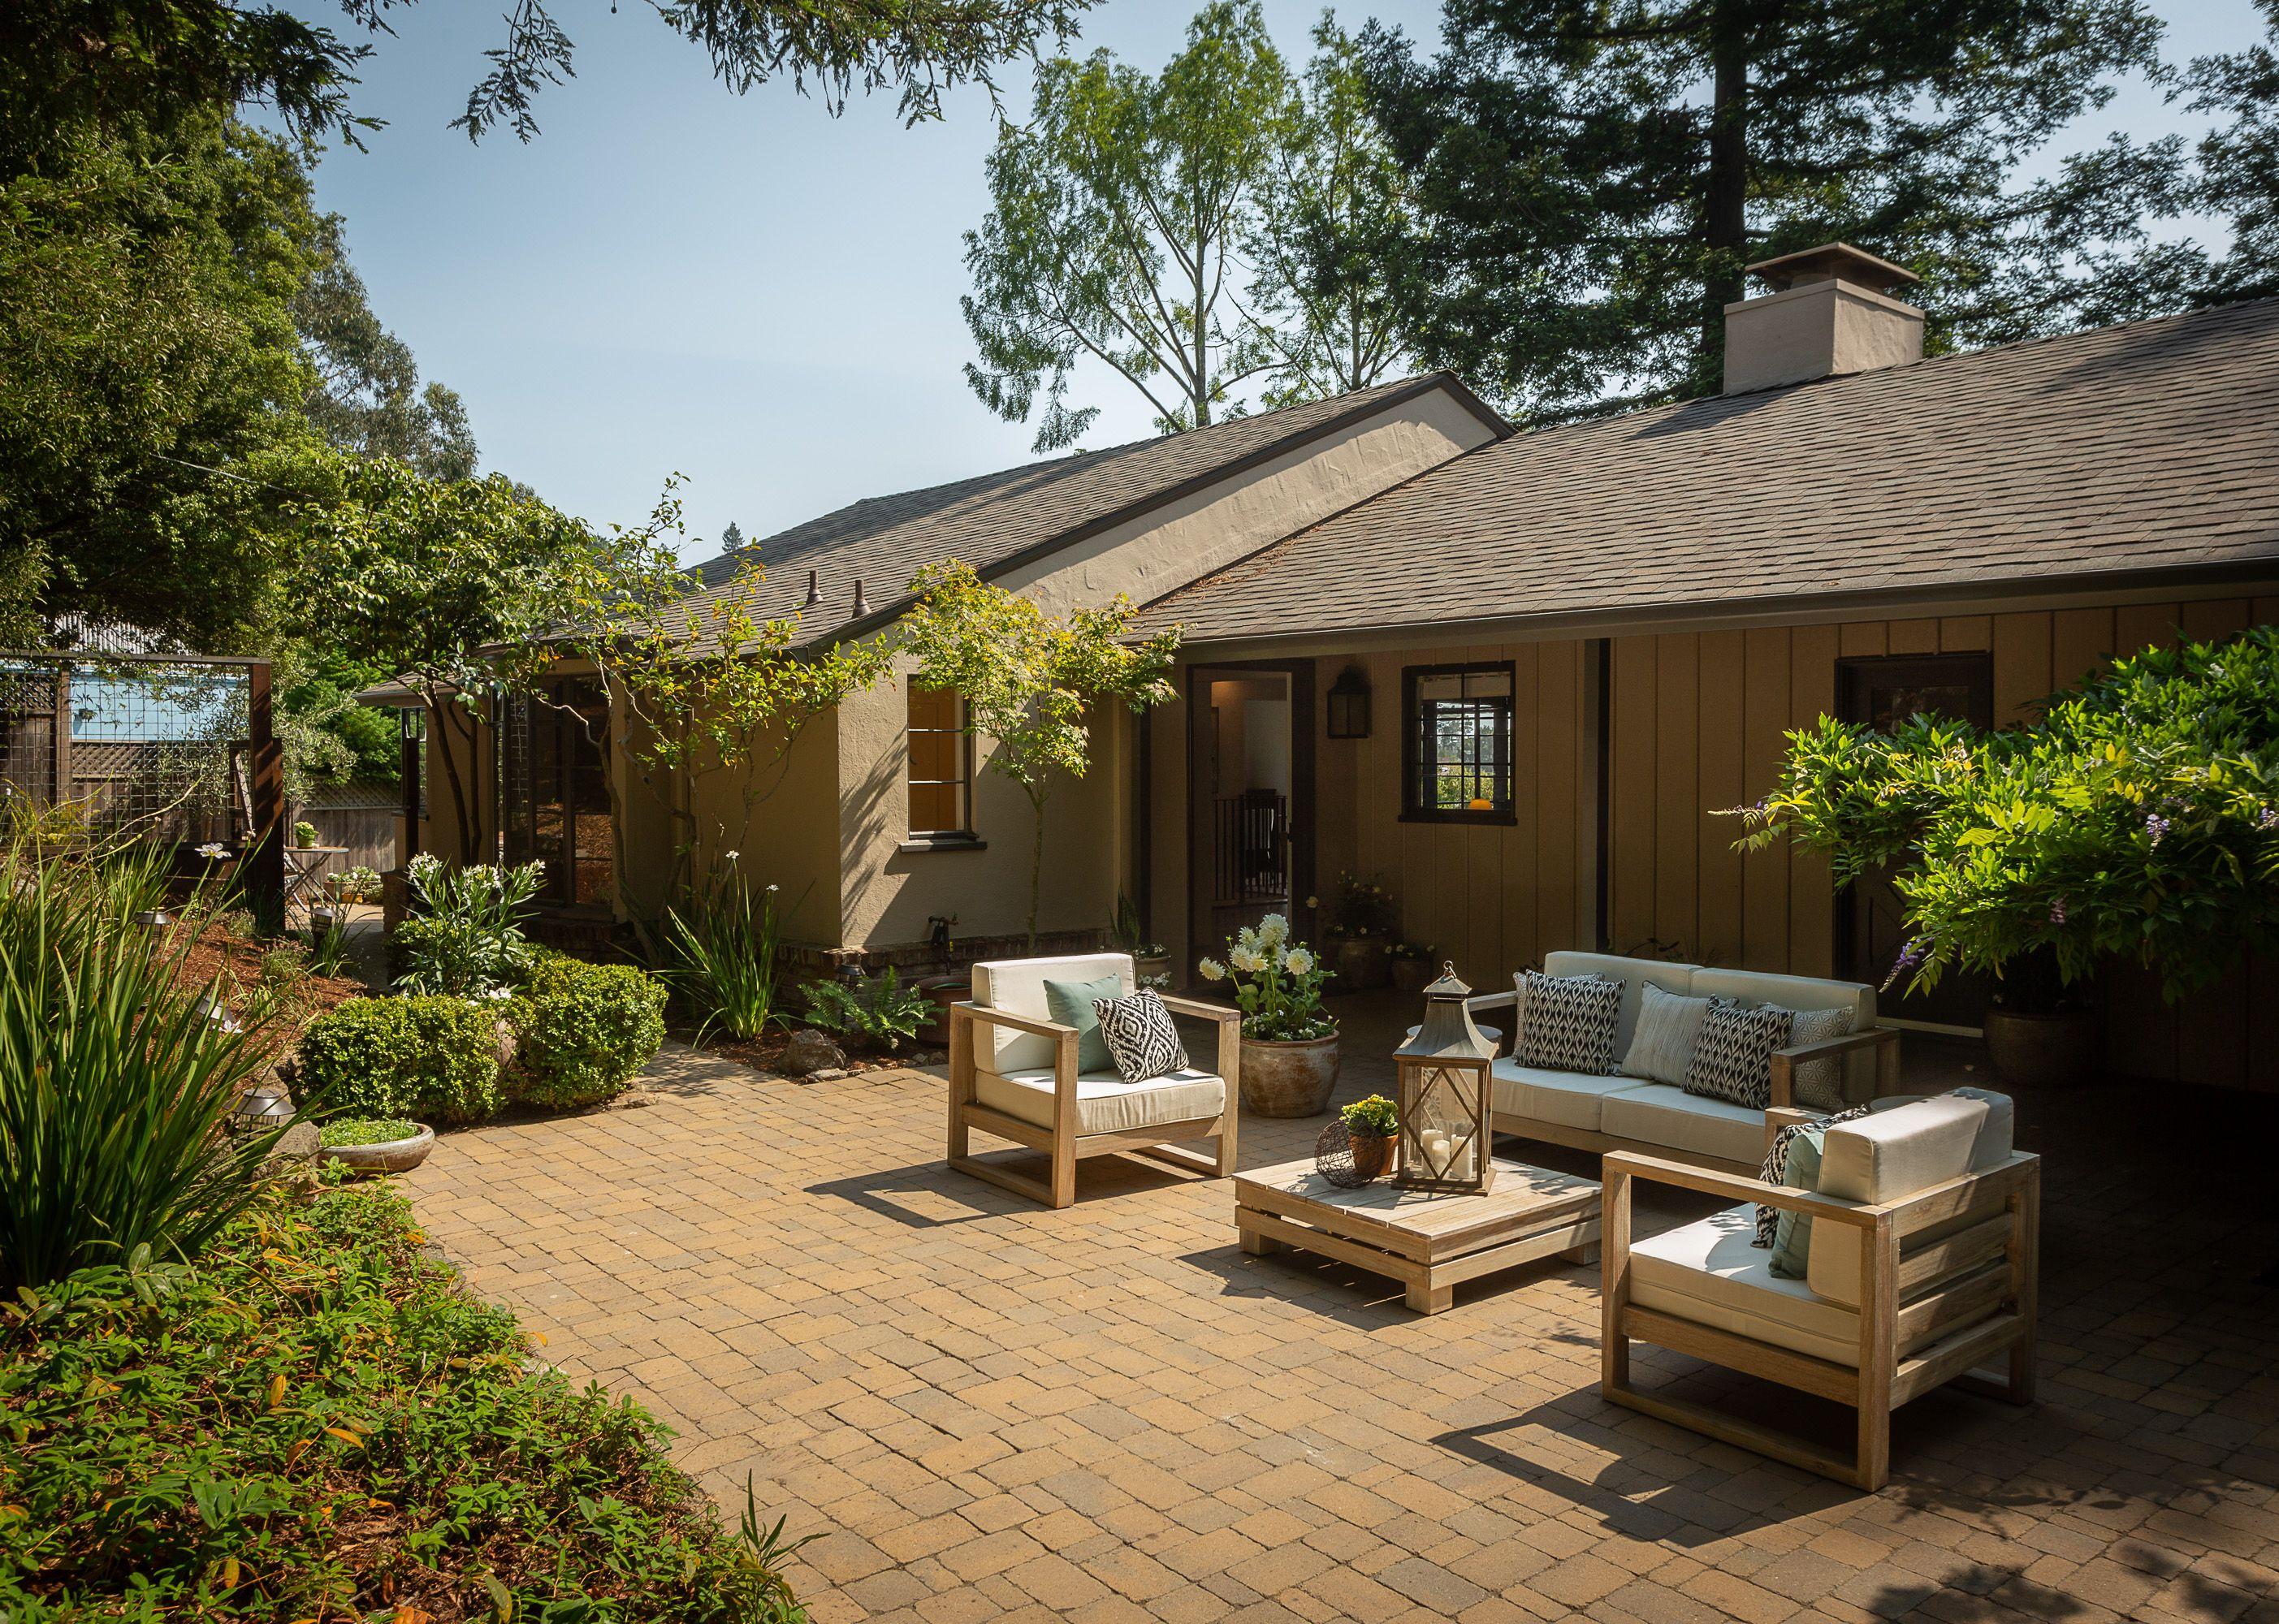 210 Sunnyside Ave, Piedmont, CA 94611   RealEstate.com